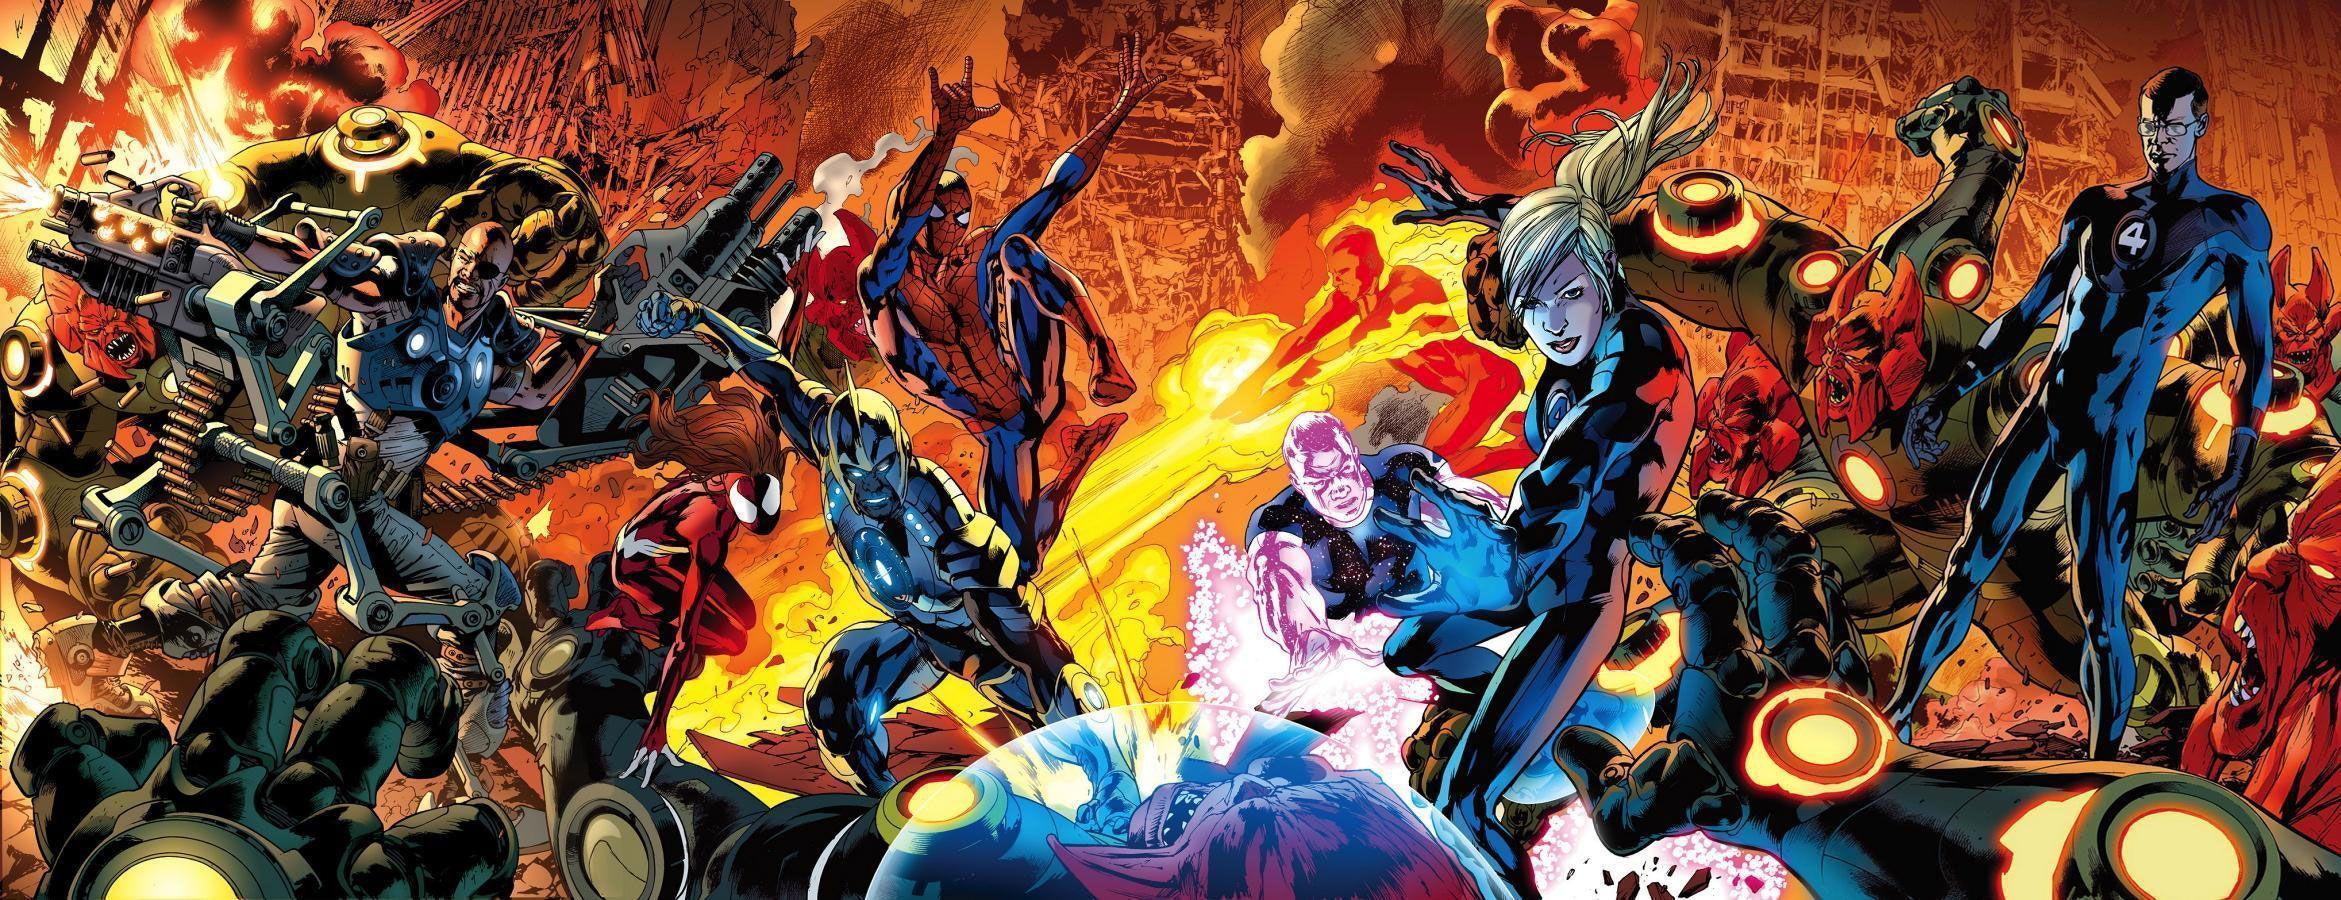 Best 49 The Avengers Wallpaper On Hipwallpaper: Fantastic Four Wallpapers